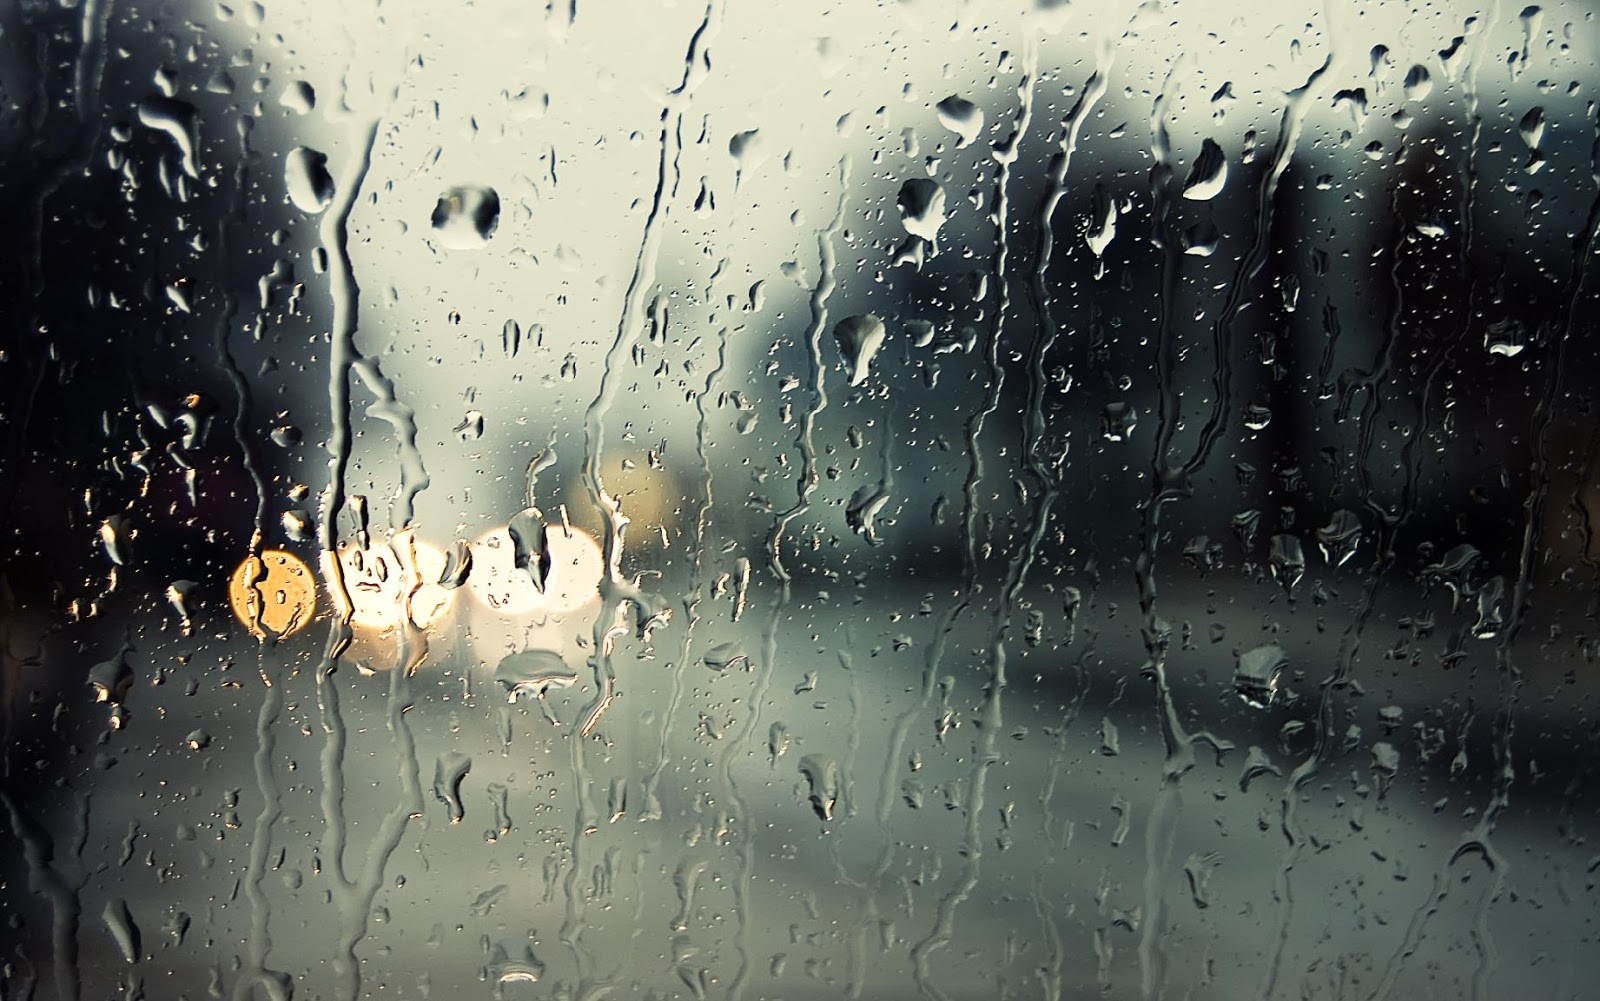 73+ Gambar Animasi Romantis Saat Hujan Paling Hist